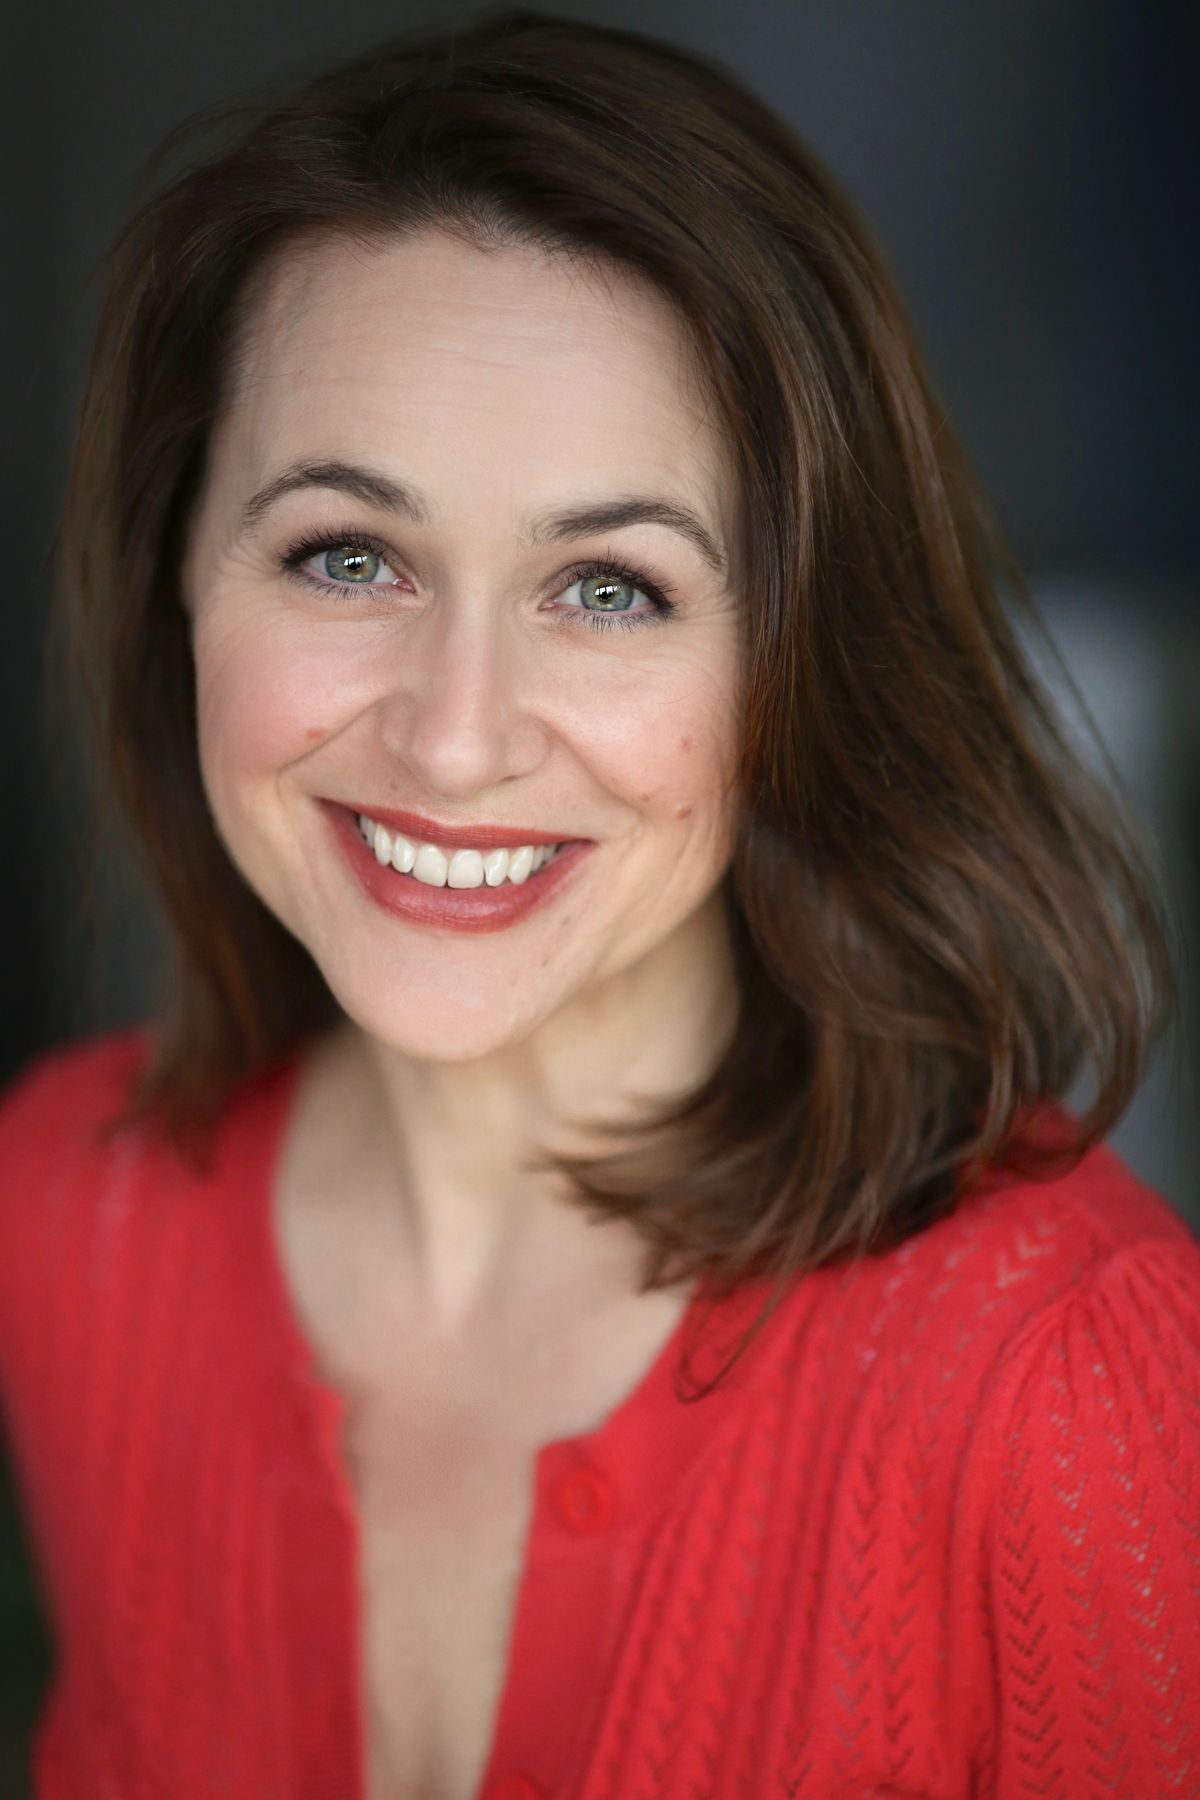 Annalene Beechey